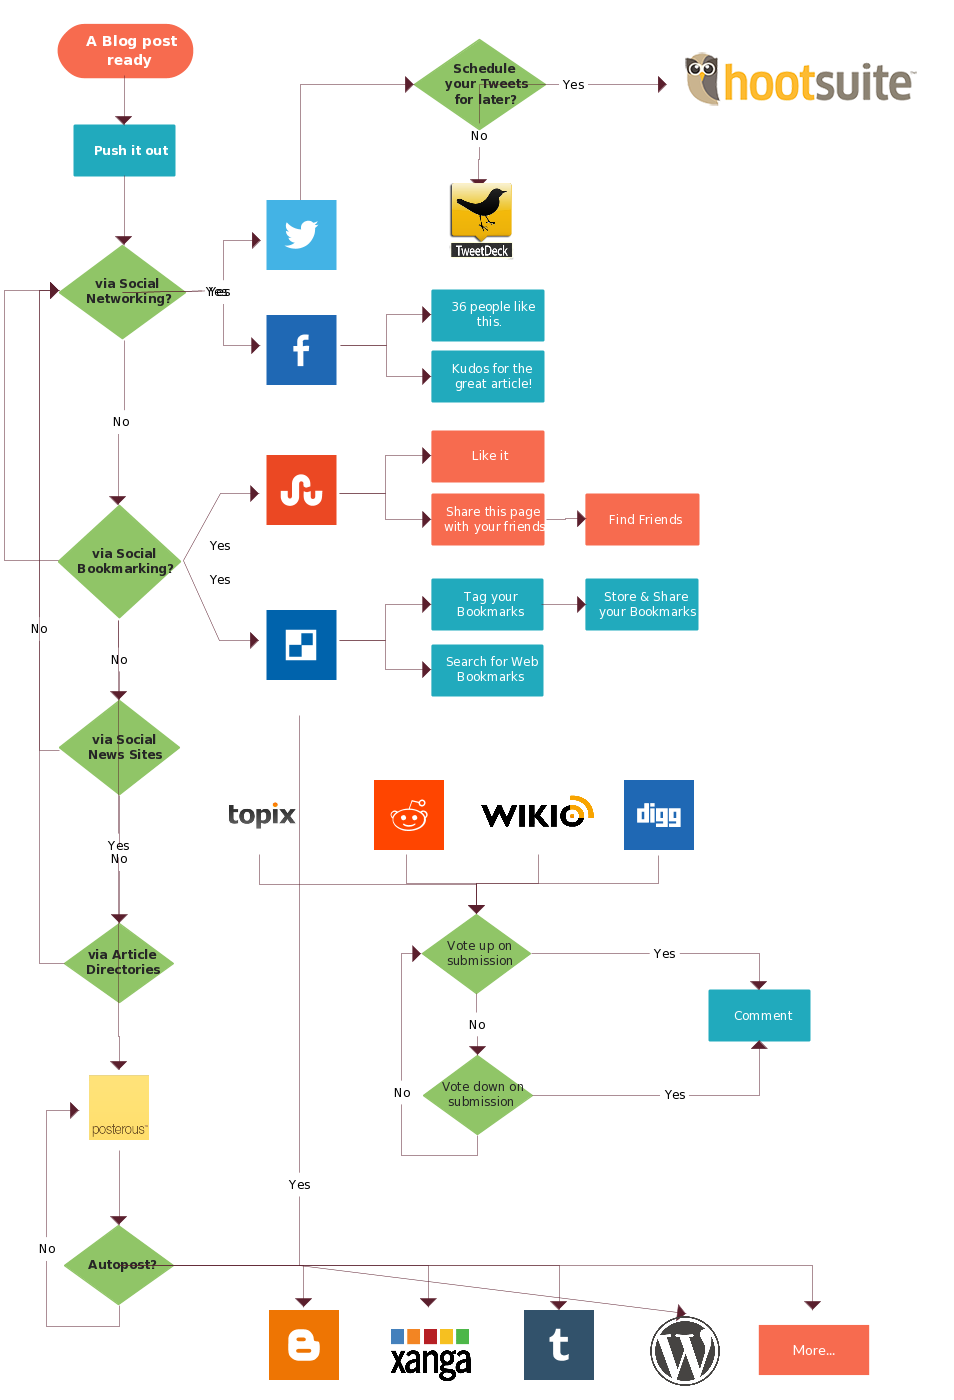 medium resolution of gcg1e07q1 954 1400 business logic marketing automation social marketing process